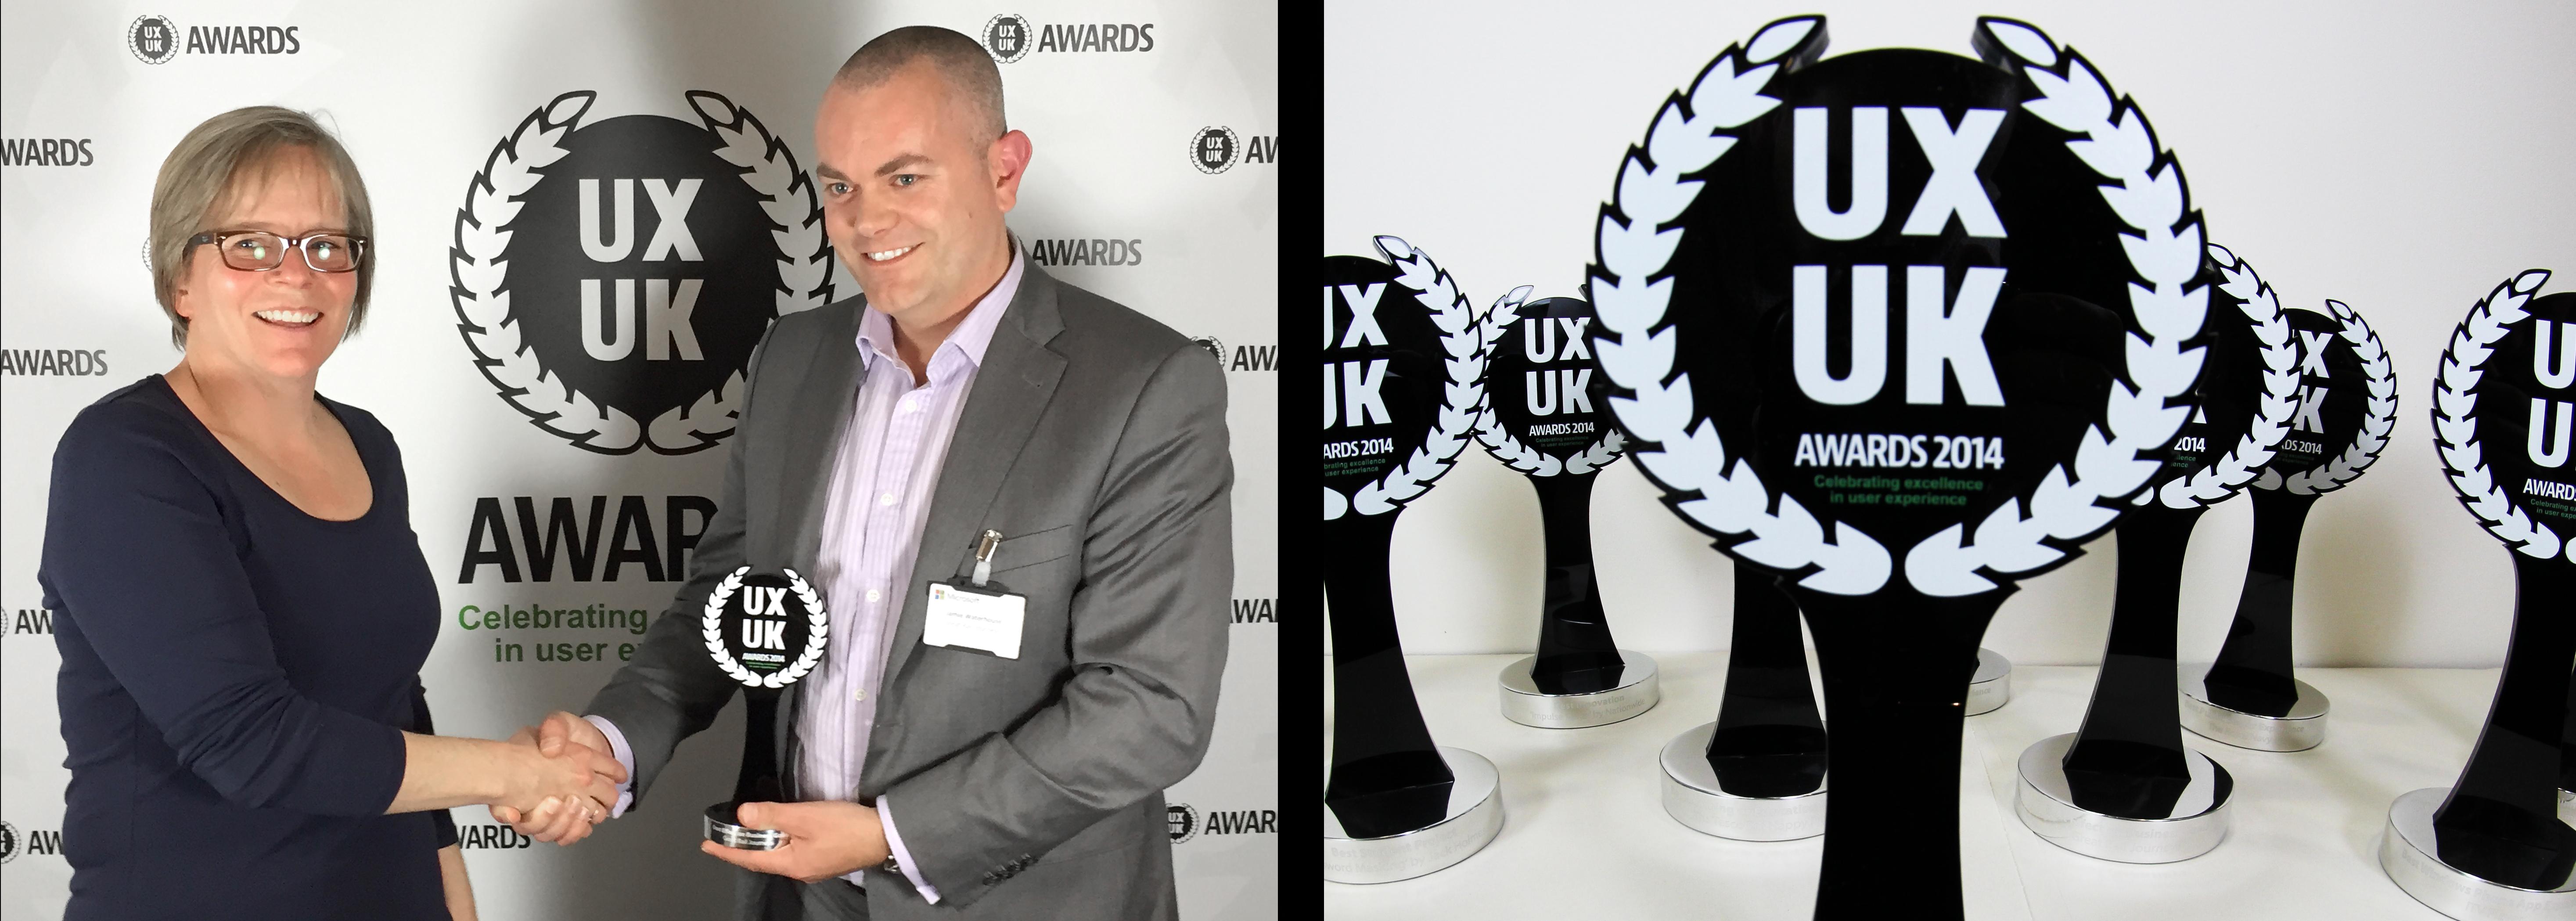 UXUK Awards winner